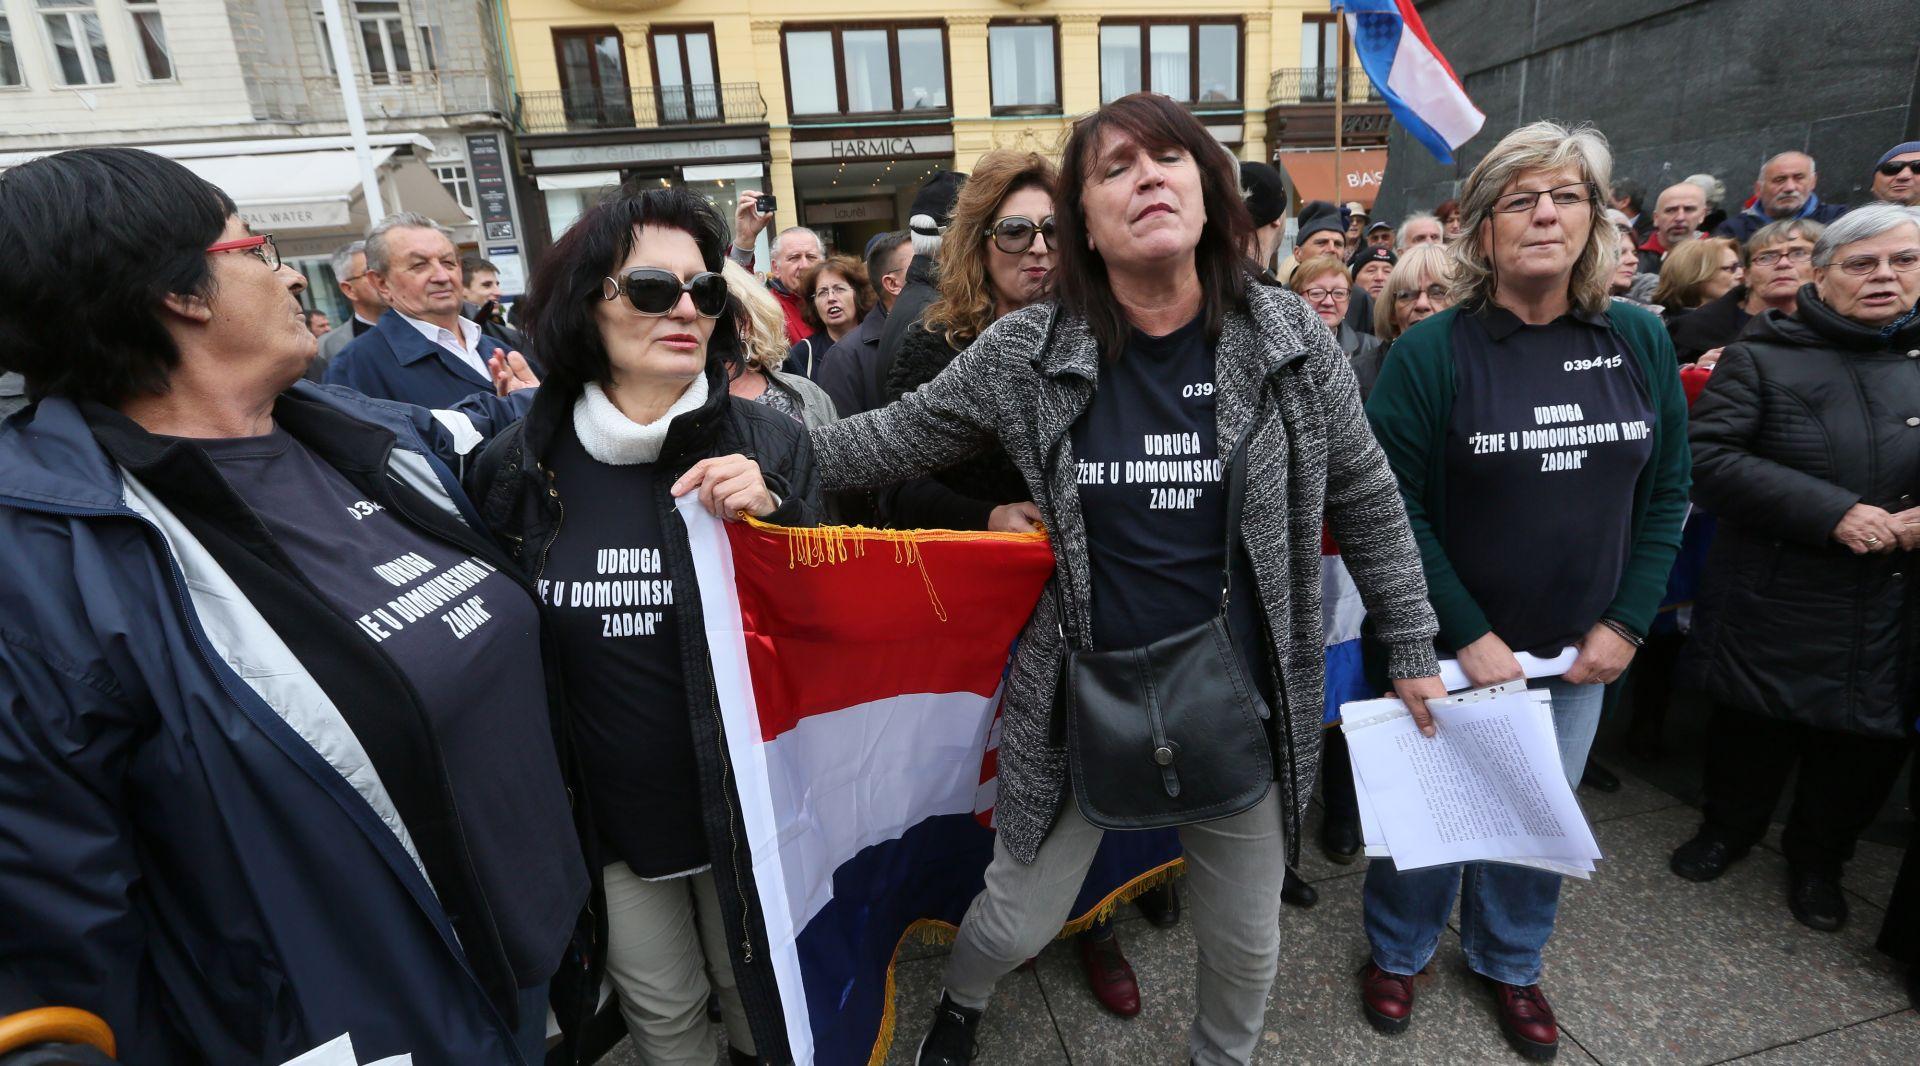 Skup potpore Udruge žene iz Domovinskog rata bivšem ministru Hasanbegoviću